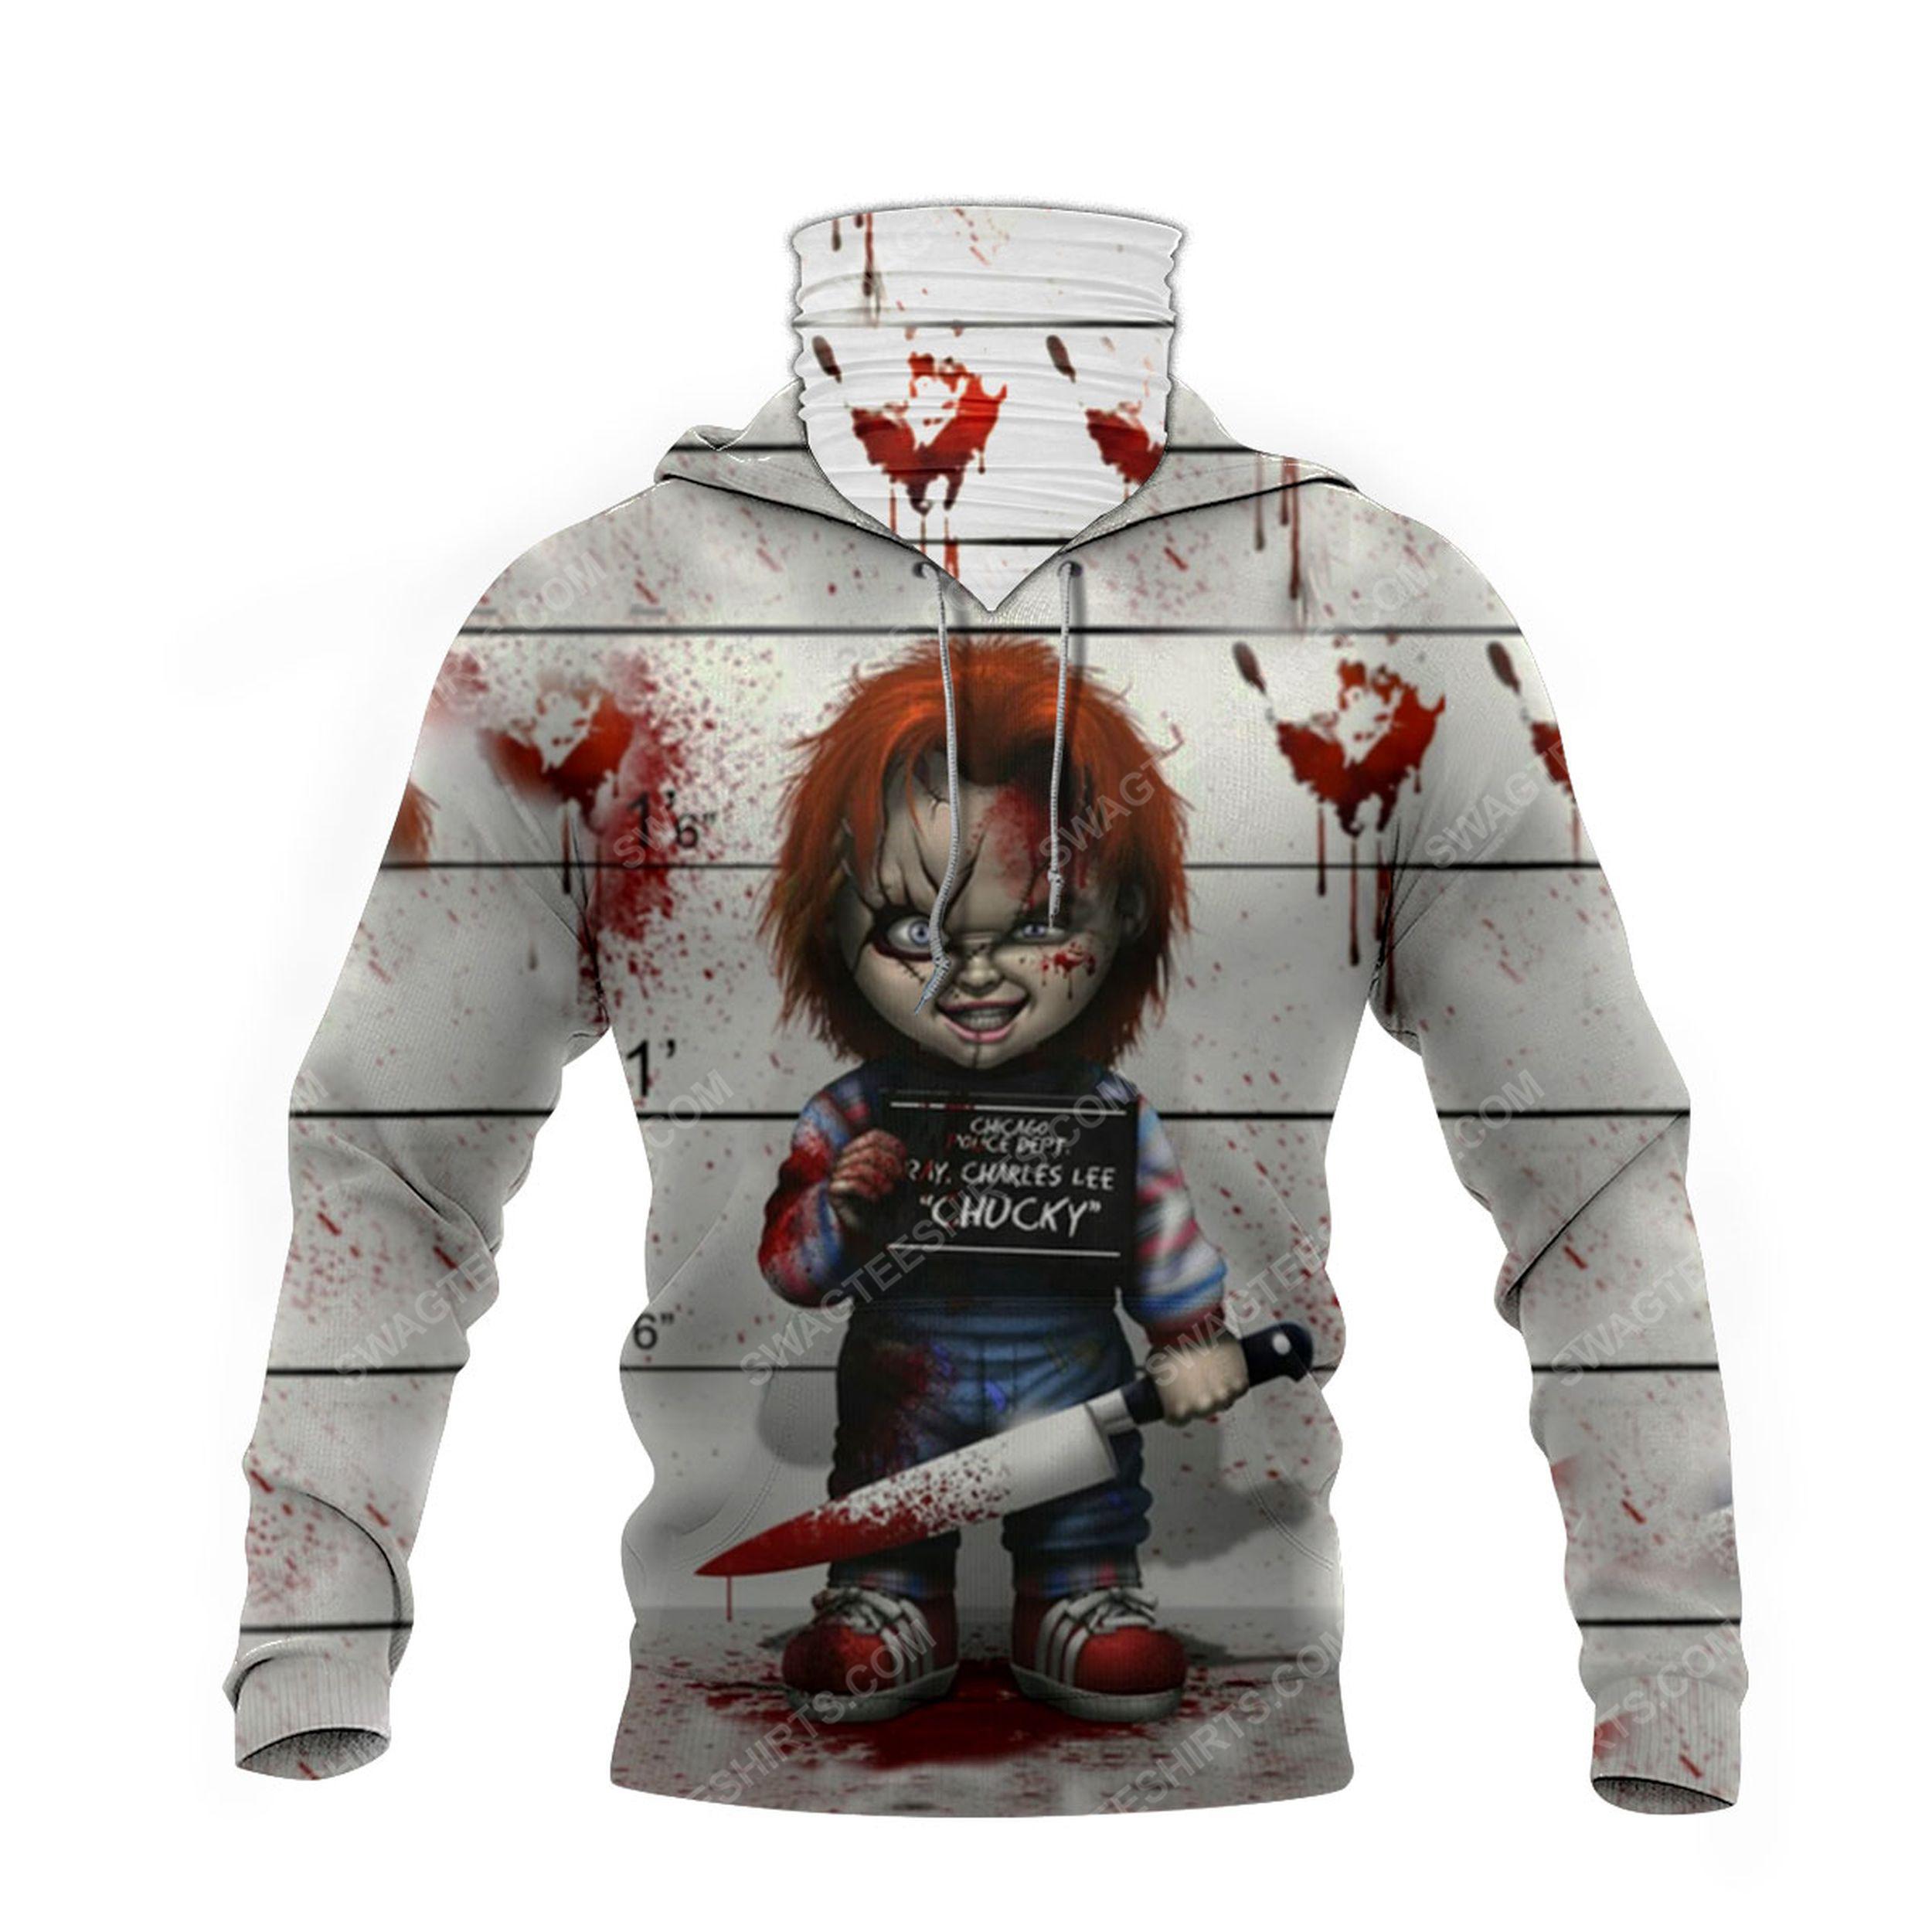 Horror movie chucky doll for halloween full print mask hoodie 4(1)